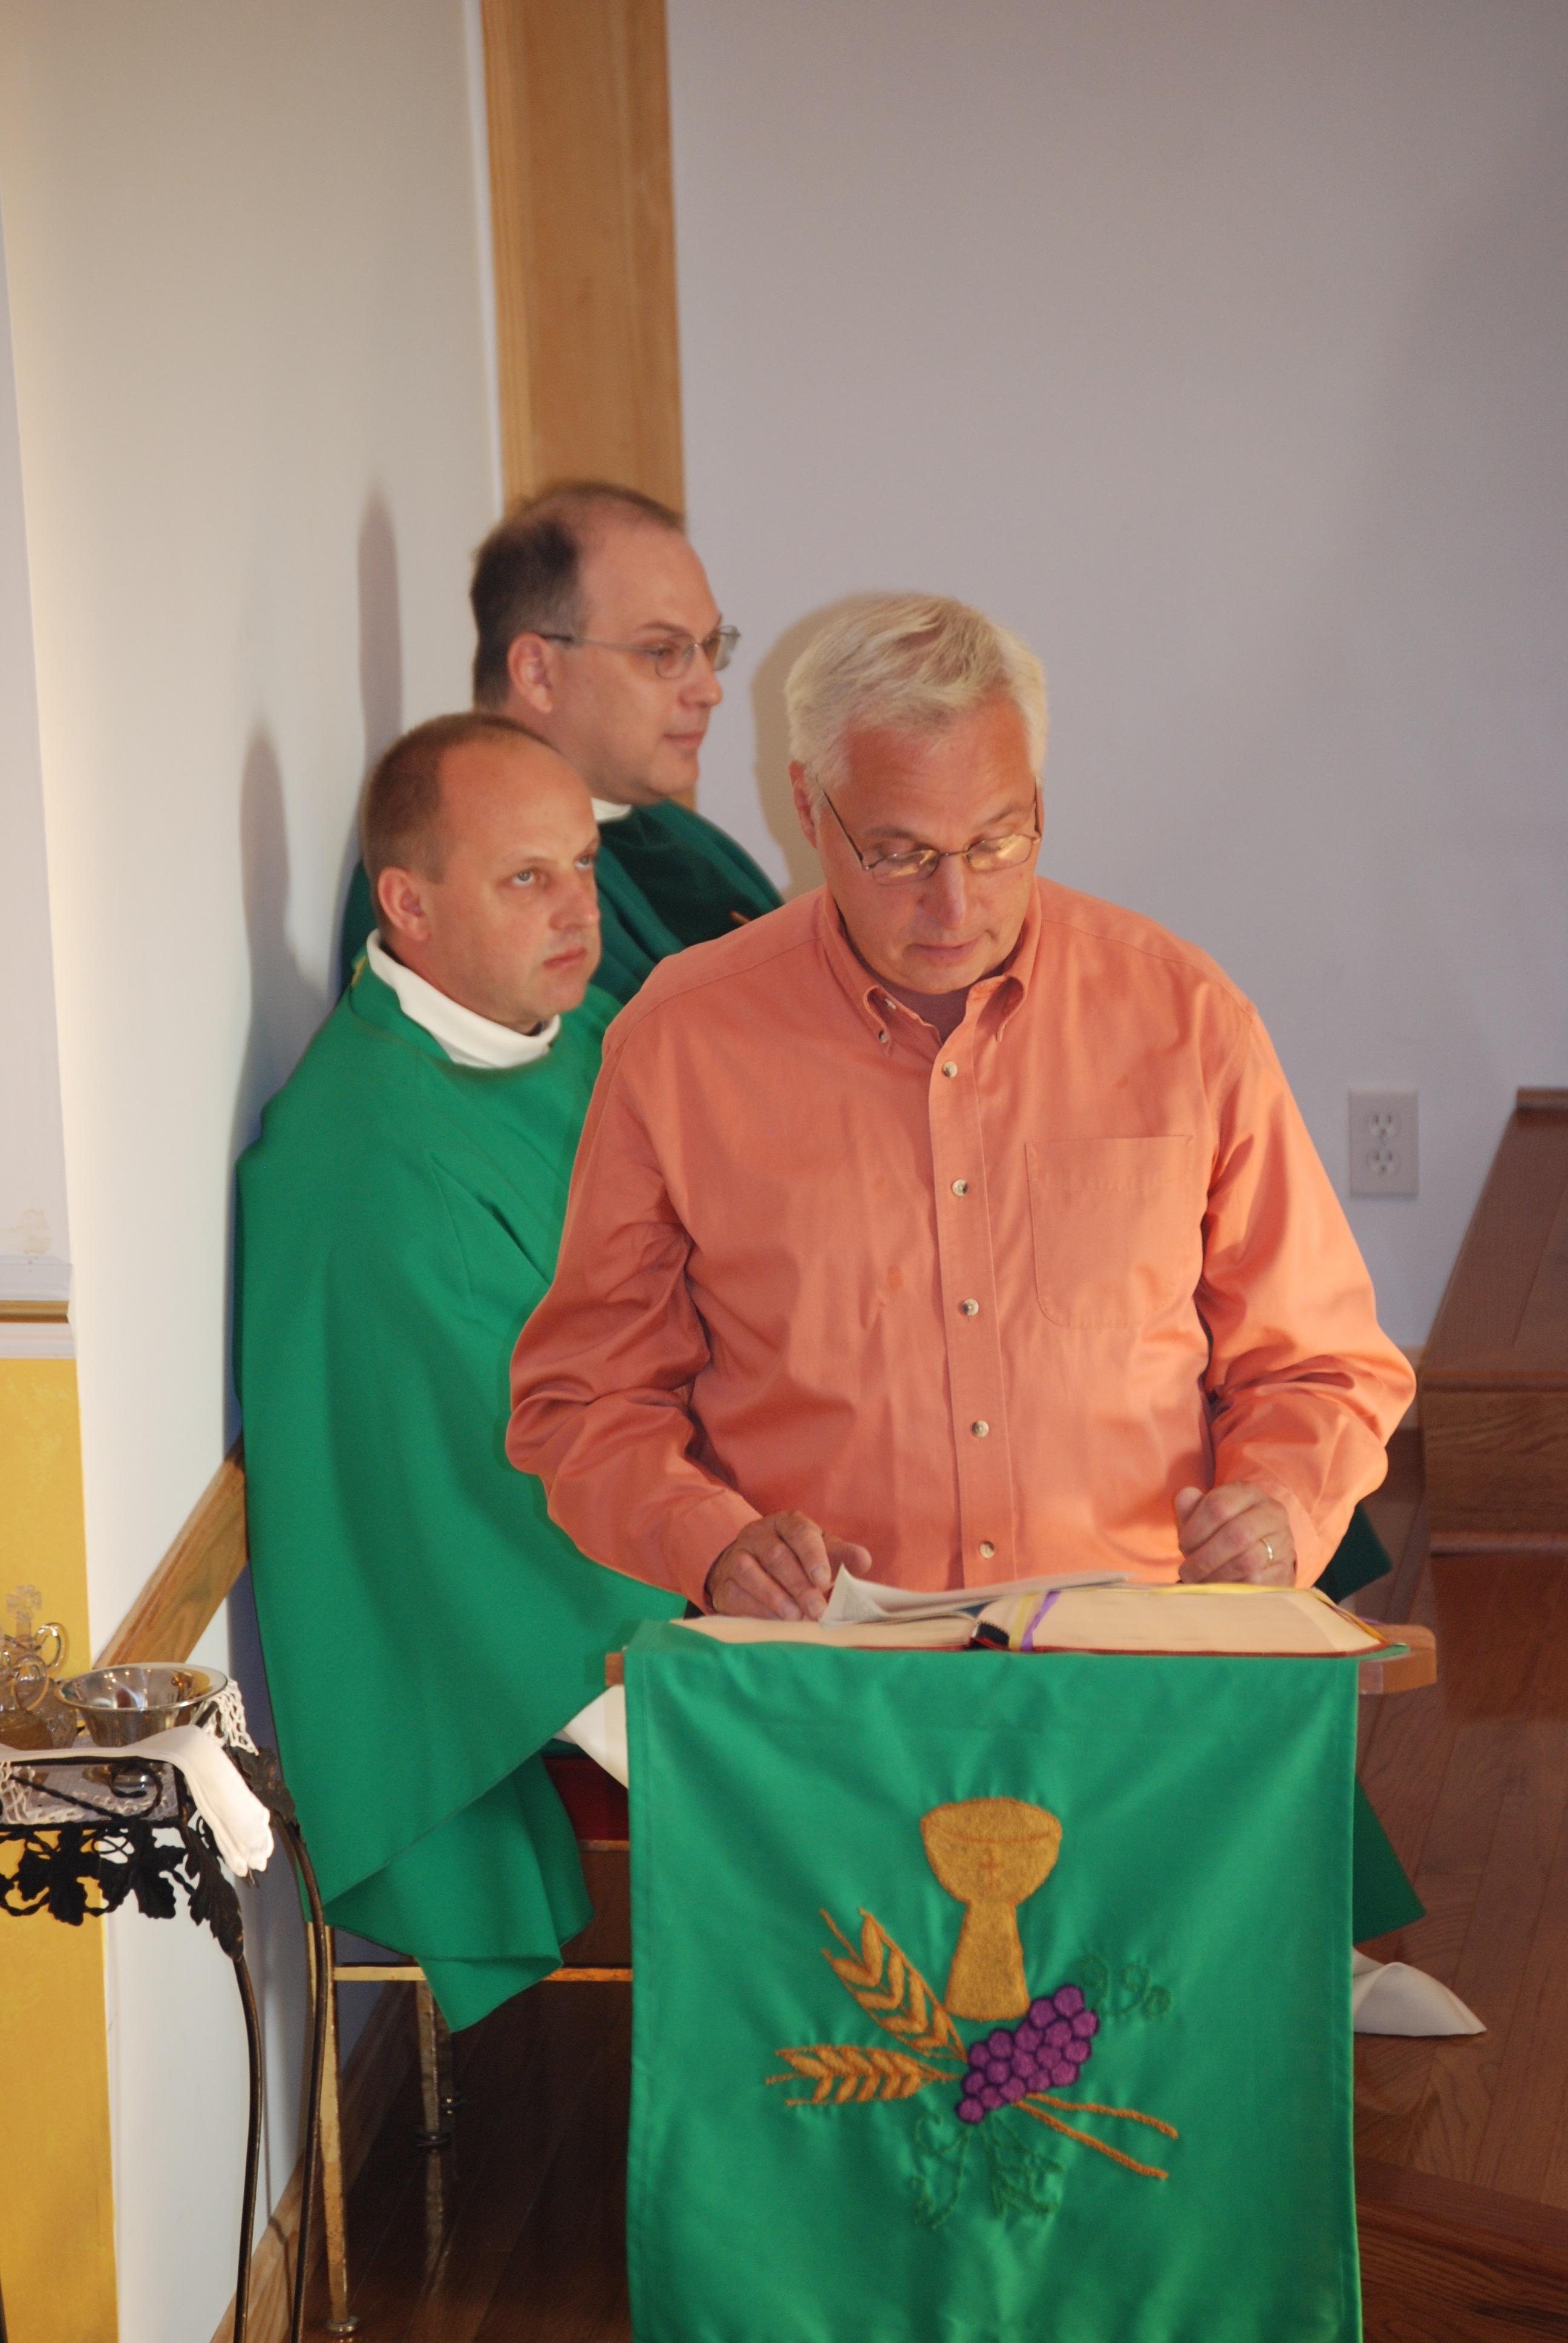 Katolske seminarians dating top 10 aussie dating sites